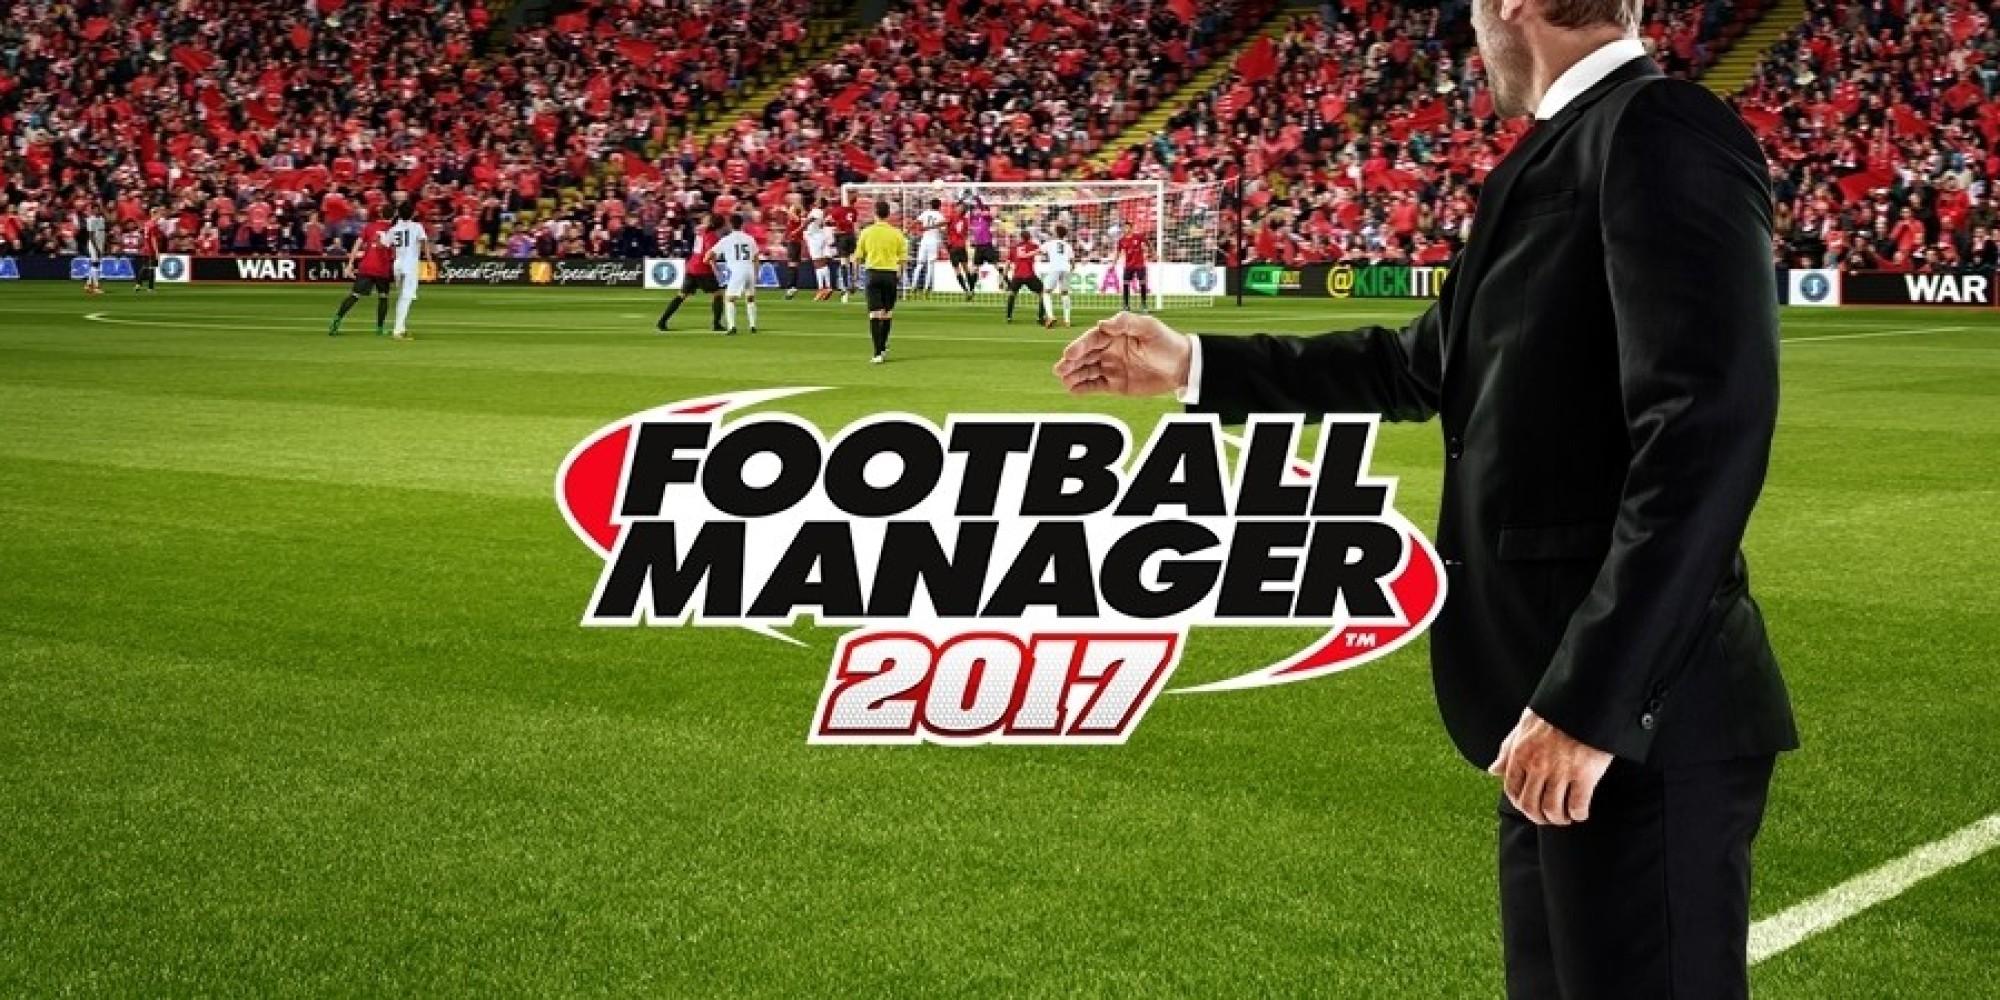 football manager 2012 download crack